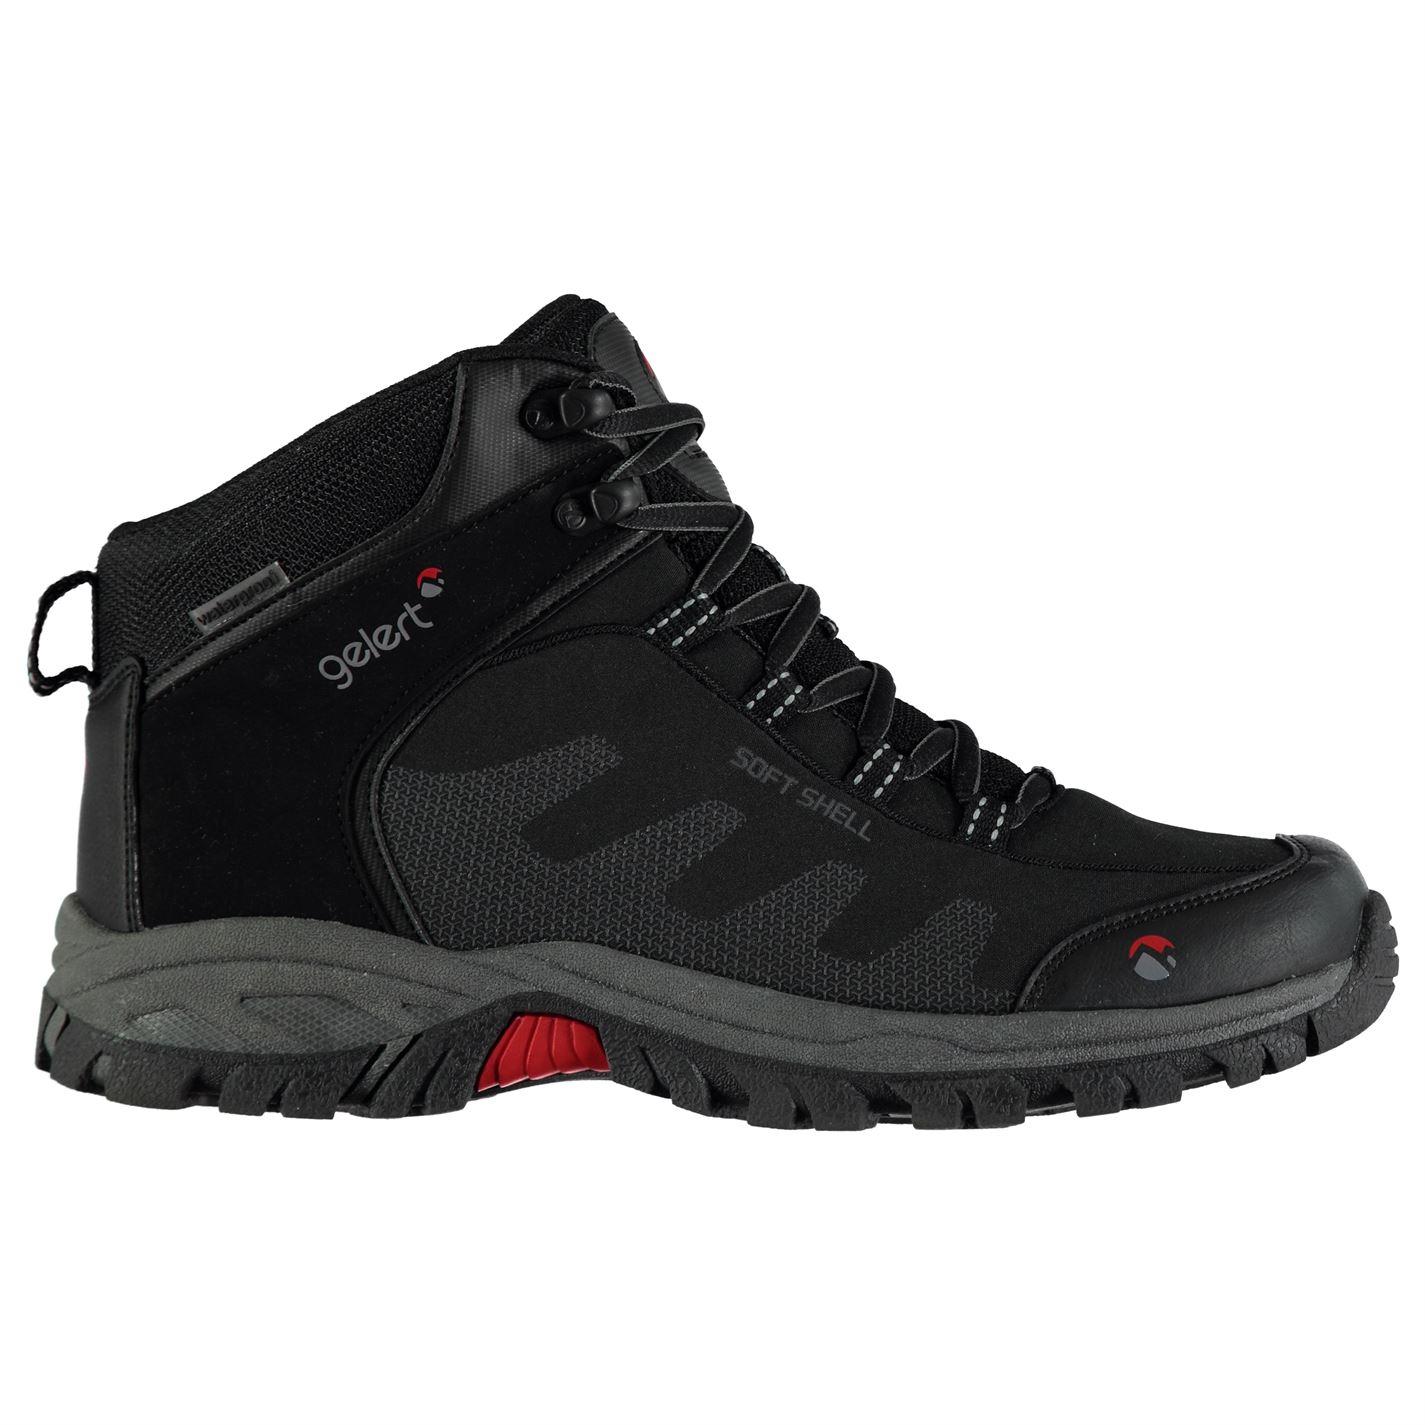 Gelert Softshell Mid pánské Walking Boots